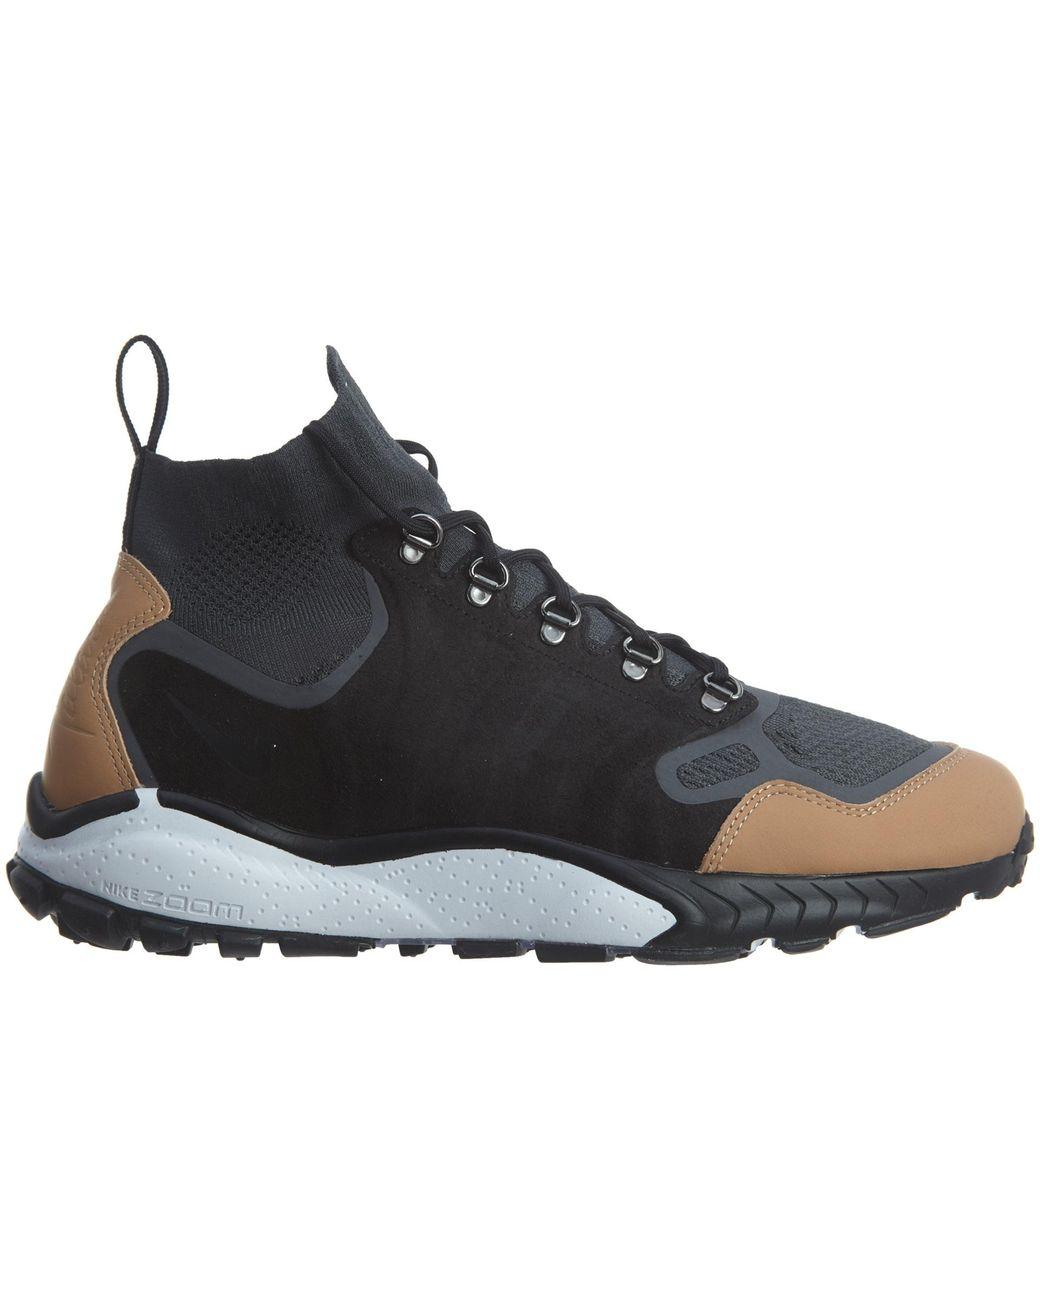 2018 sneakers wholesale online coupon code Men's Air Zoom Talaria Mid Fk Prm Anthracite Black-vachetta Tan